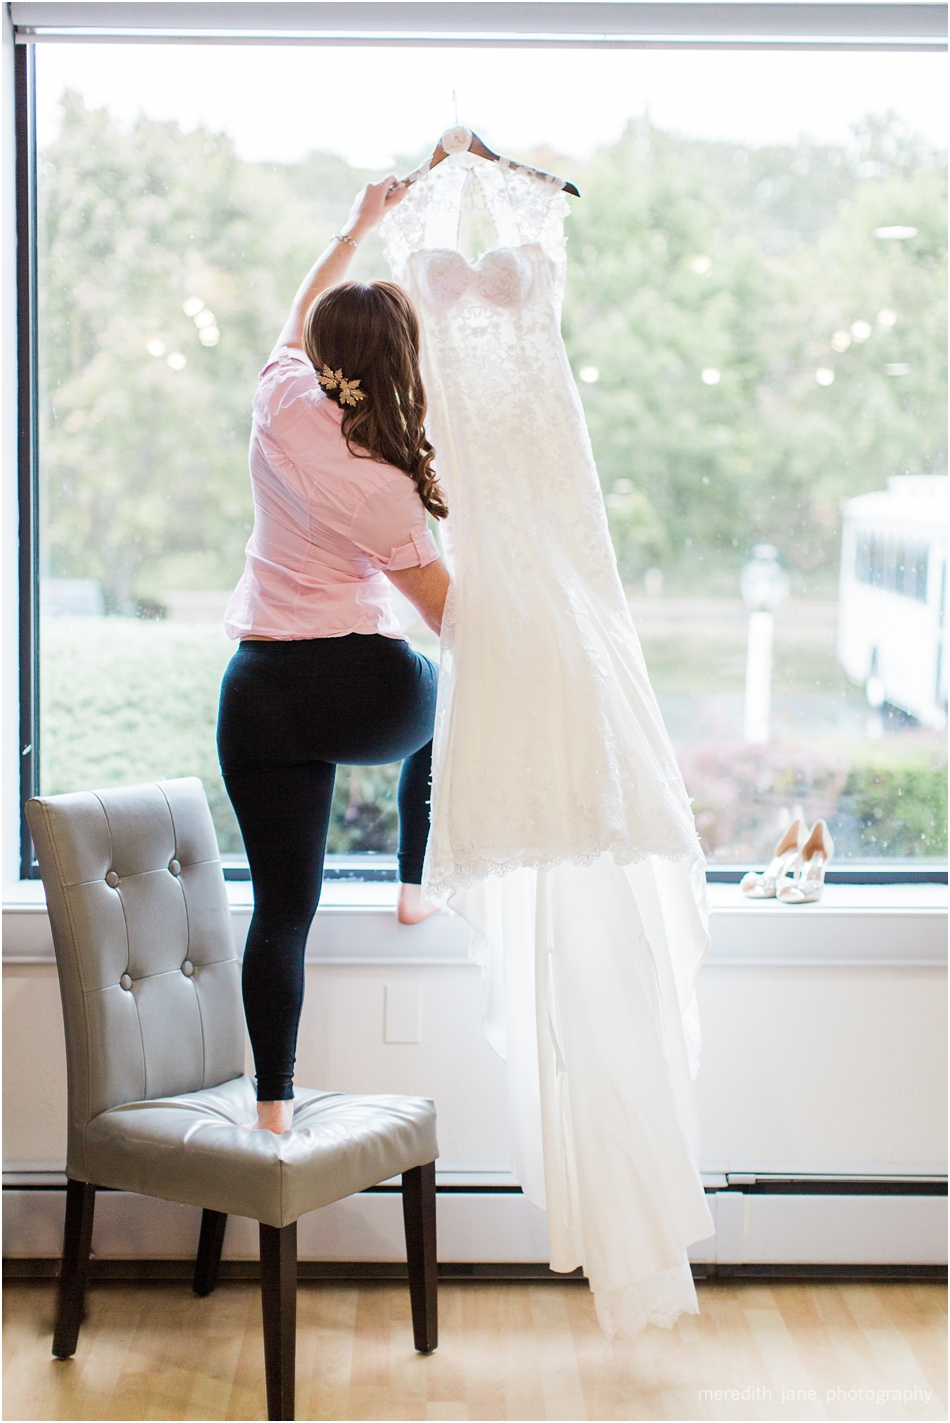 plimoth_plymouth_plantation_rainy_boston_cape_cod_wedding_photographer_meredith_jane_photography_photo_0831